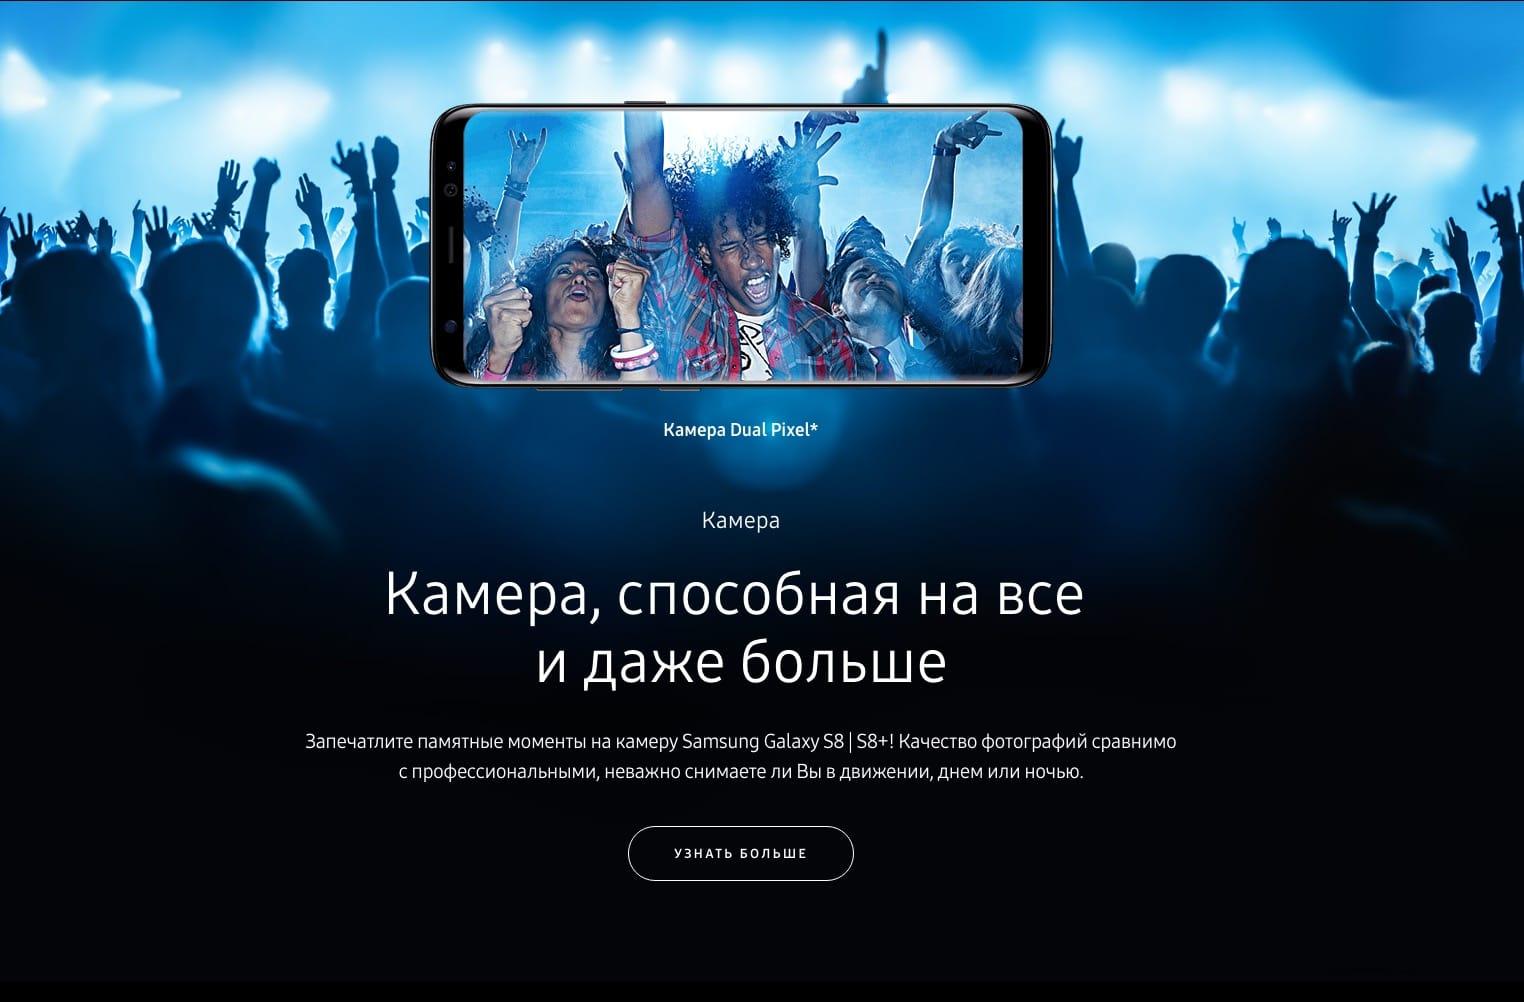 Samsung Galaxy S8 Russia Buy 1